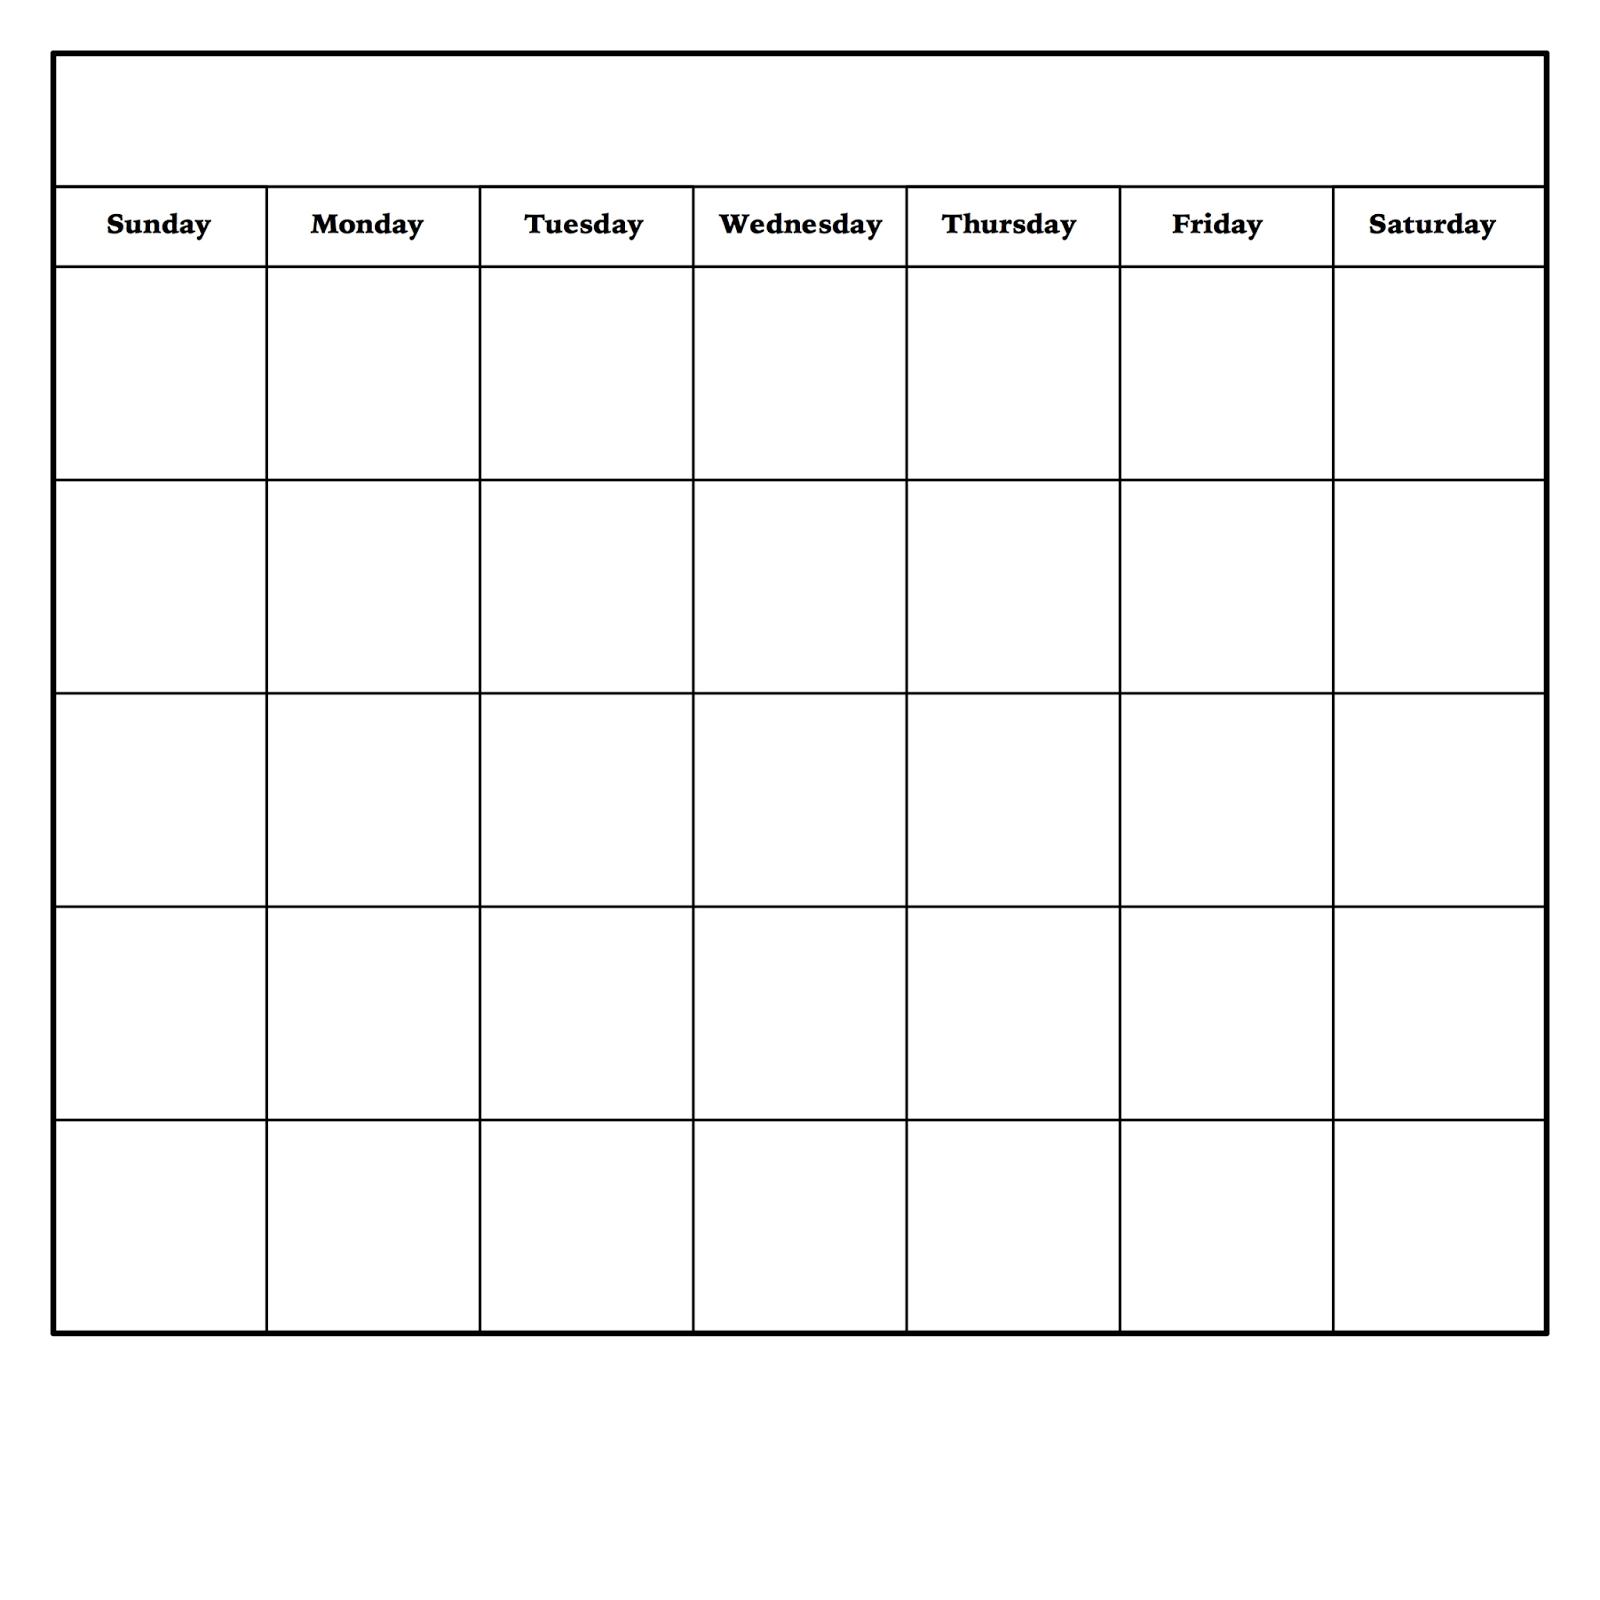 Blank Monday Through Friday Pdf | Calendar Template Printable Blank Free Printable Monday Through Friday